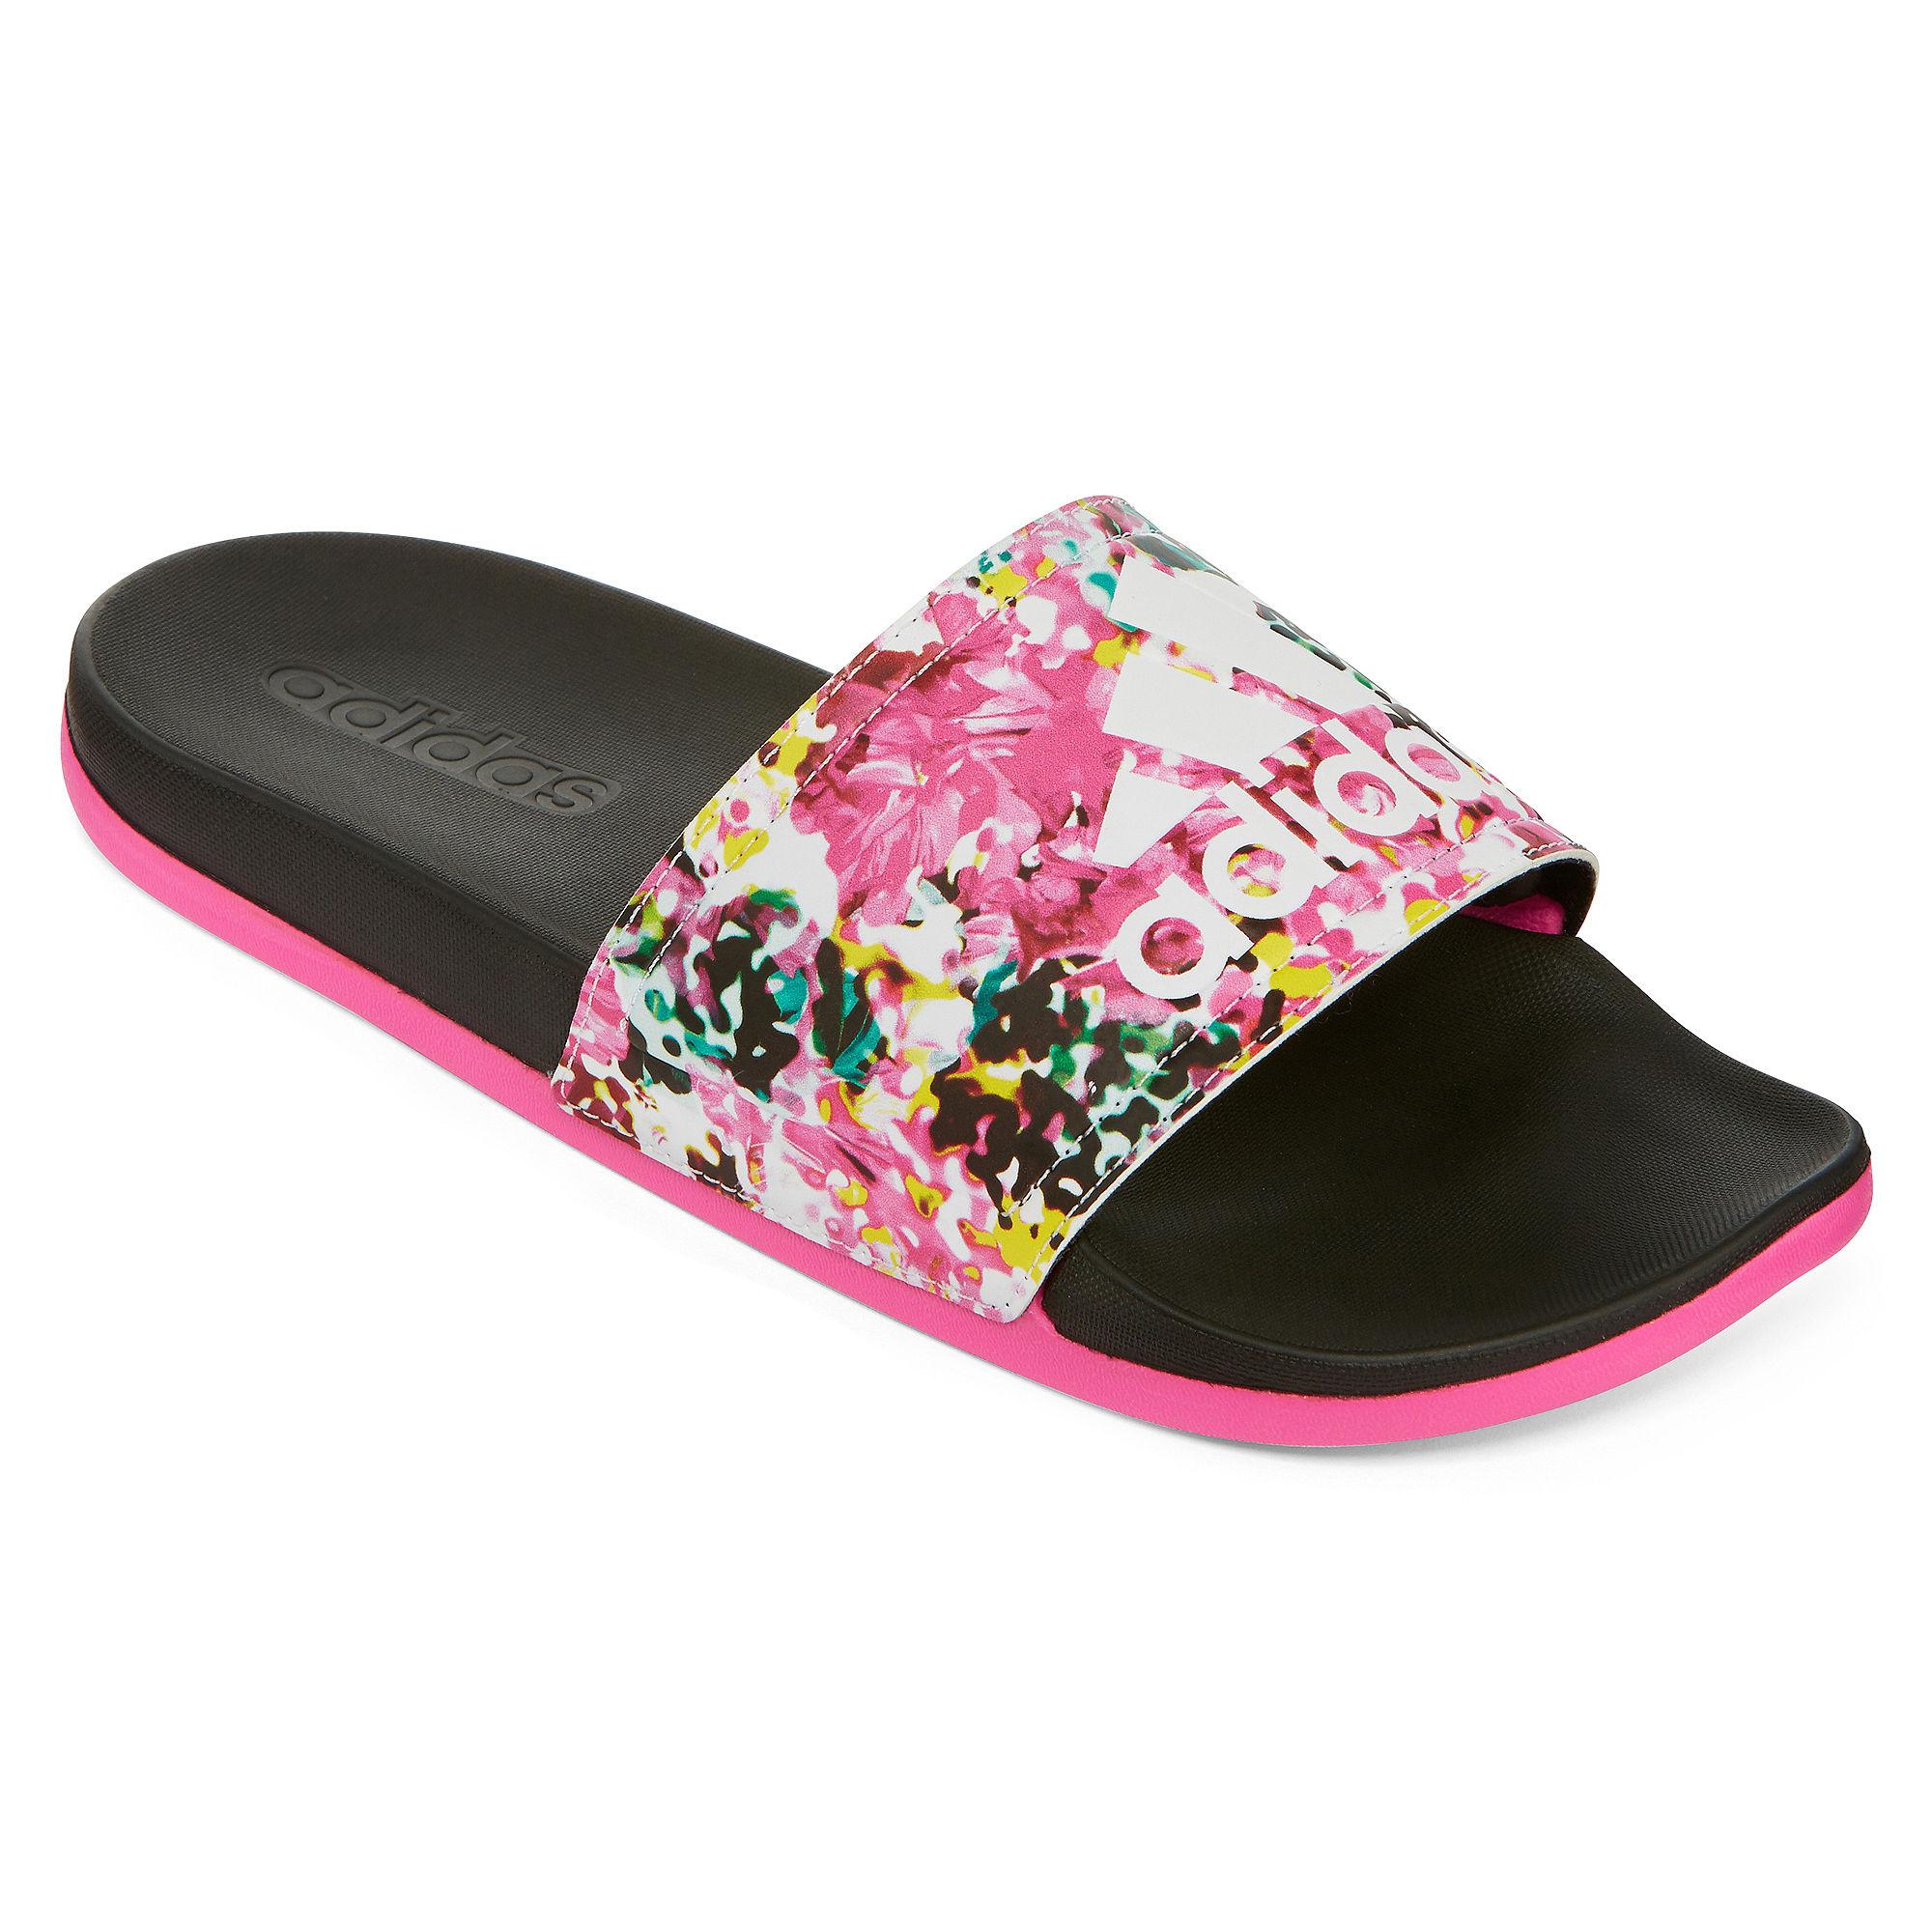 Excellent Adidas Adilette W 3-Stripes Black White Womens Sandals Slides Slippers 072329 | EBay